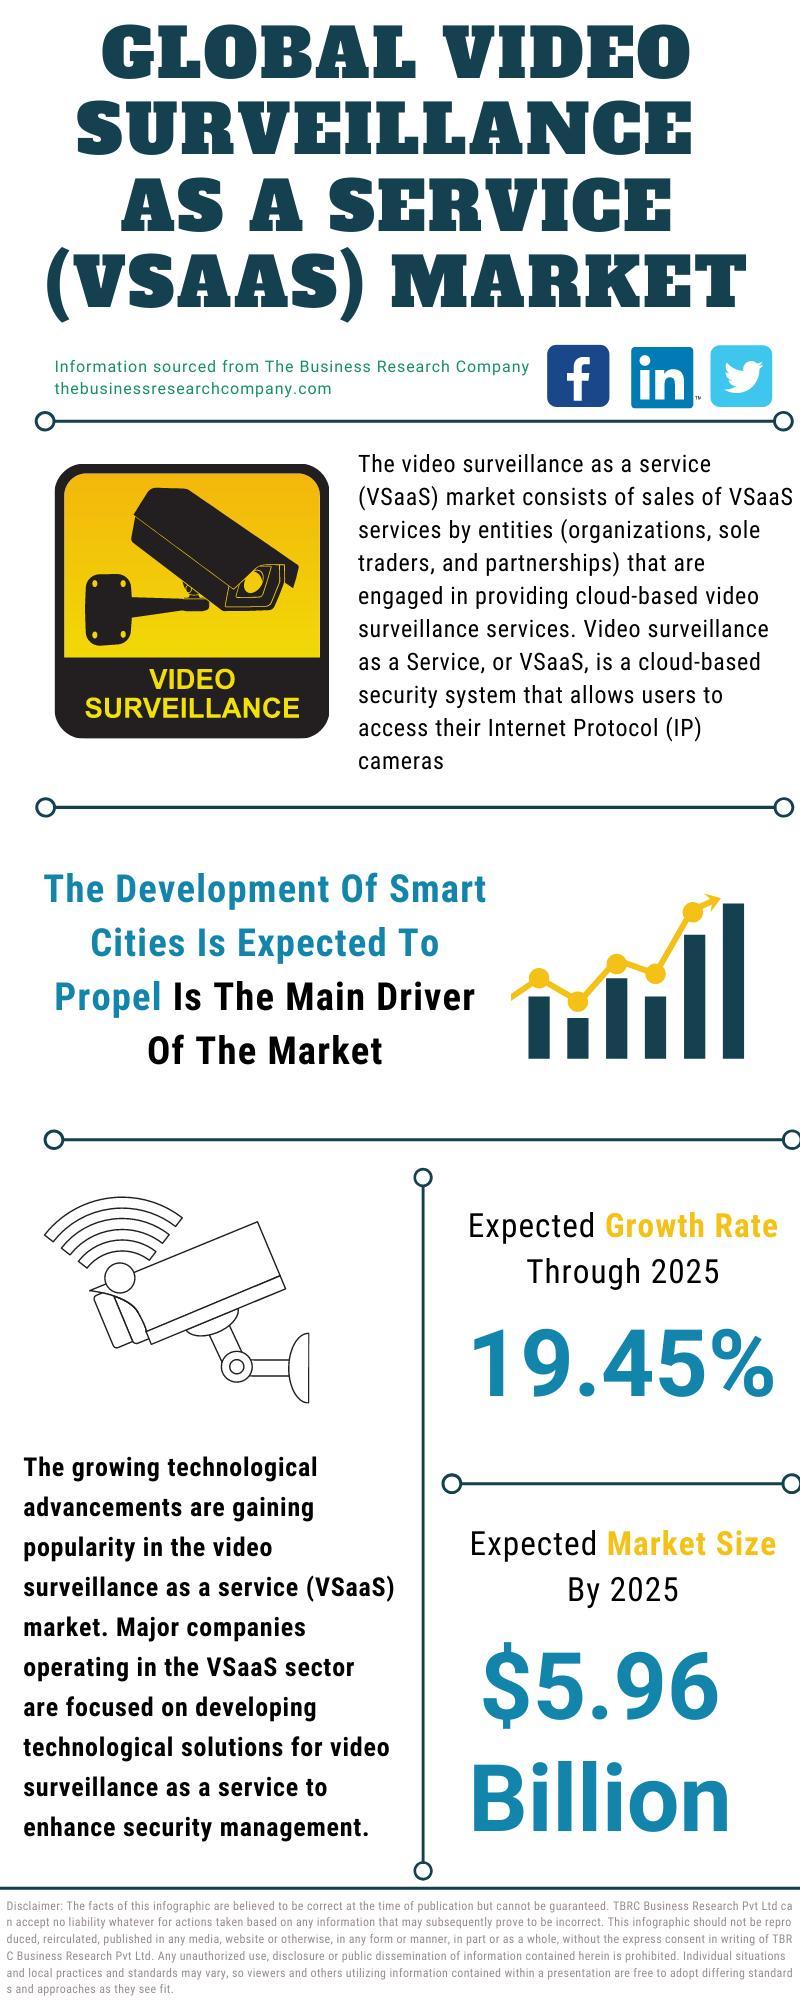 Video Surveillance As A Service (VSaaS) Market